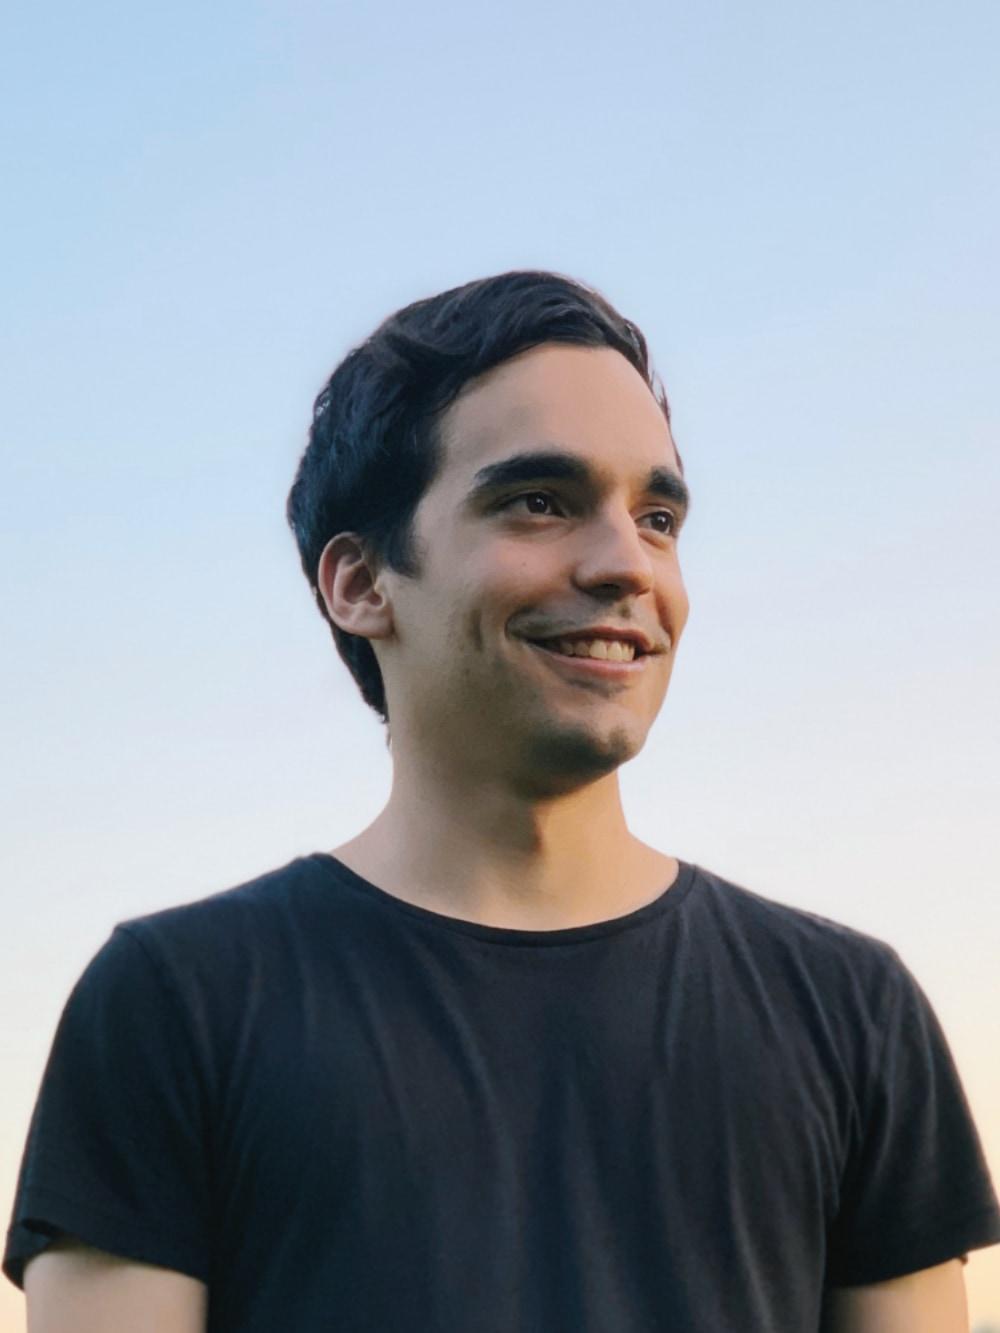 Photo of Daniel Moreno Dugarte